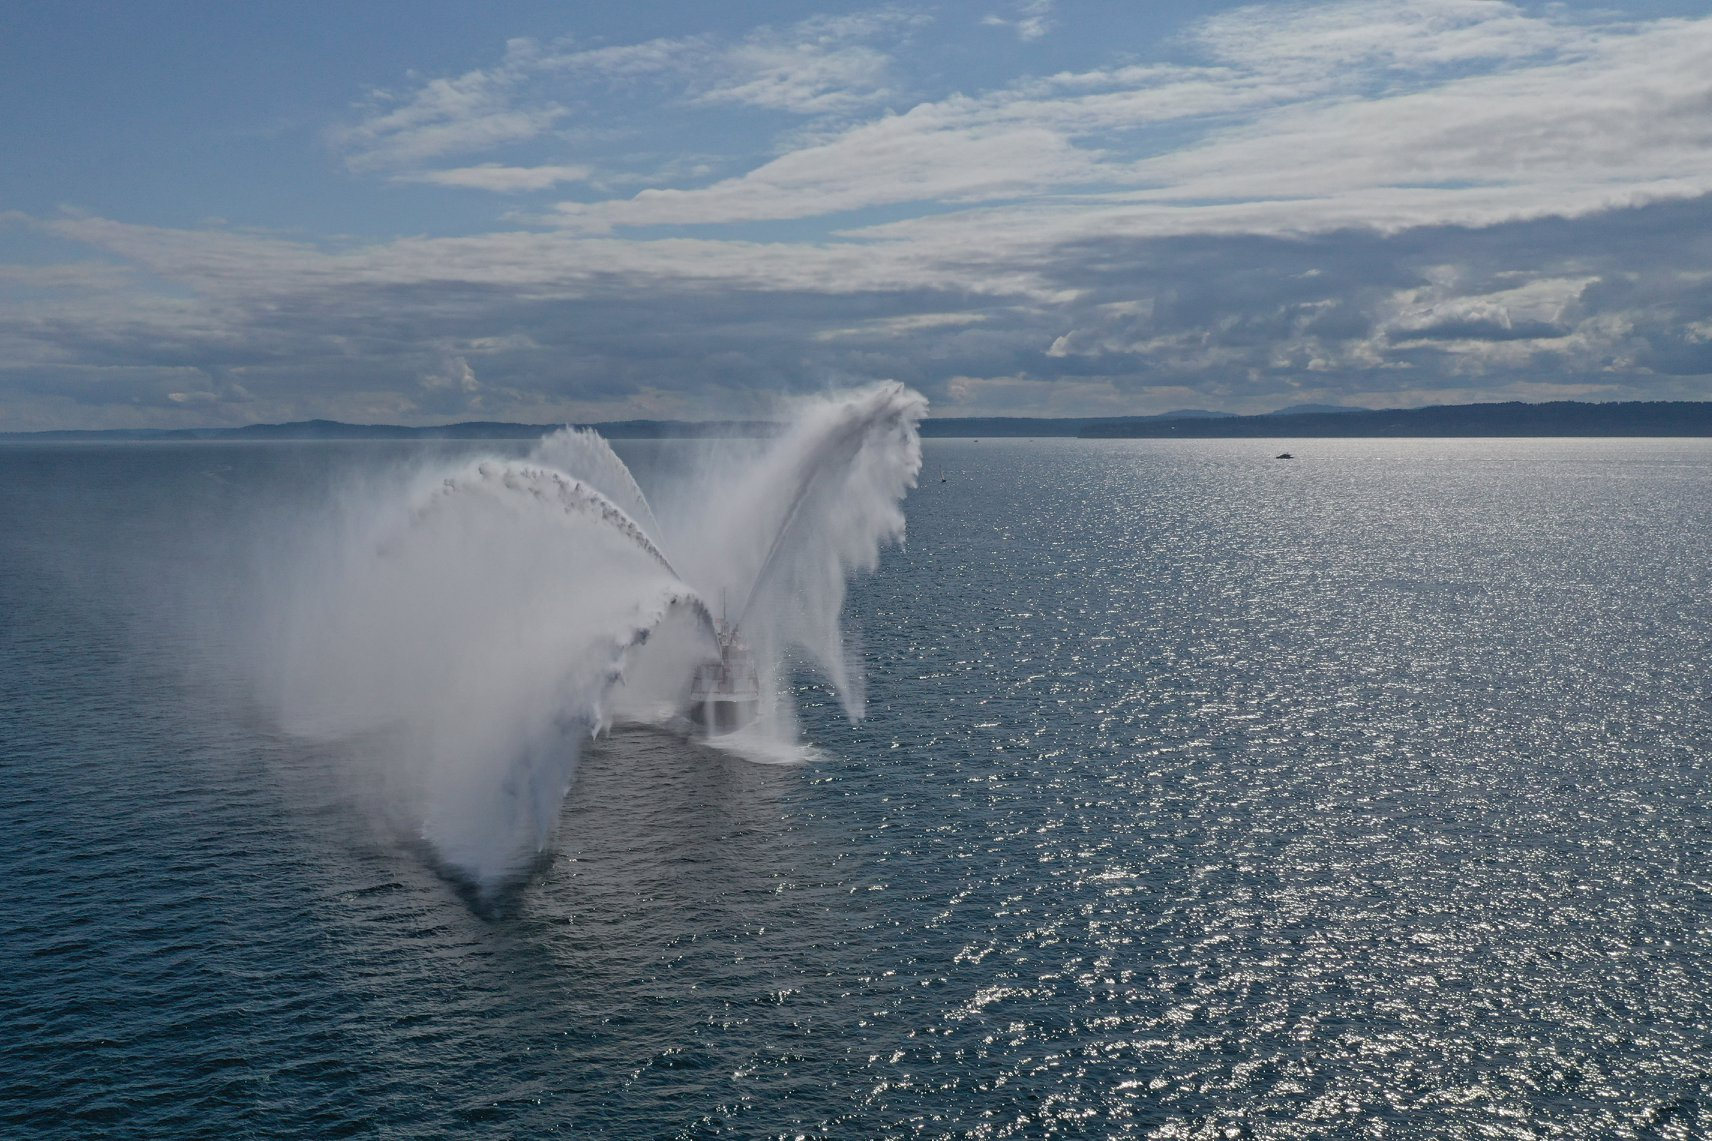 Moore 24 fleet outdoes itself by hiring celebratory fireboat